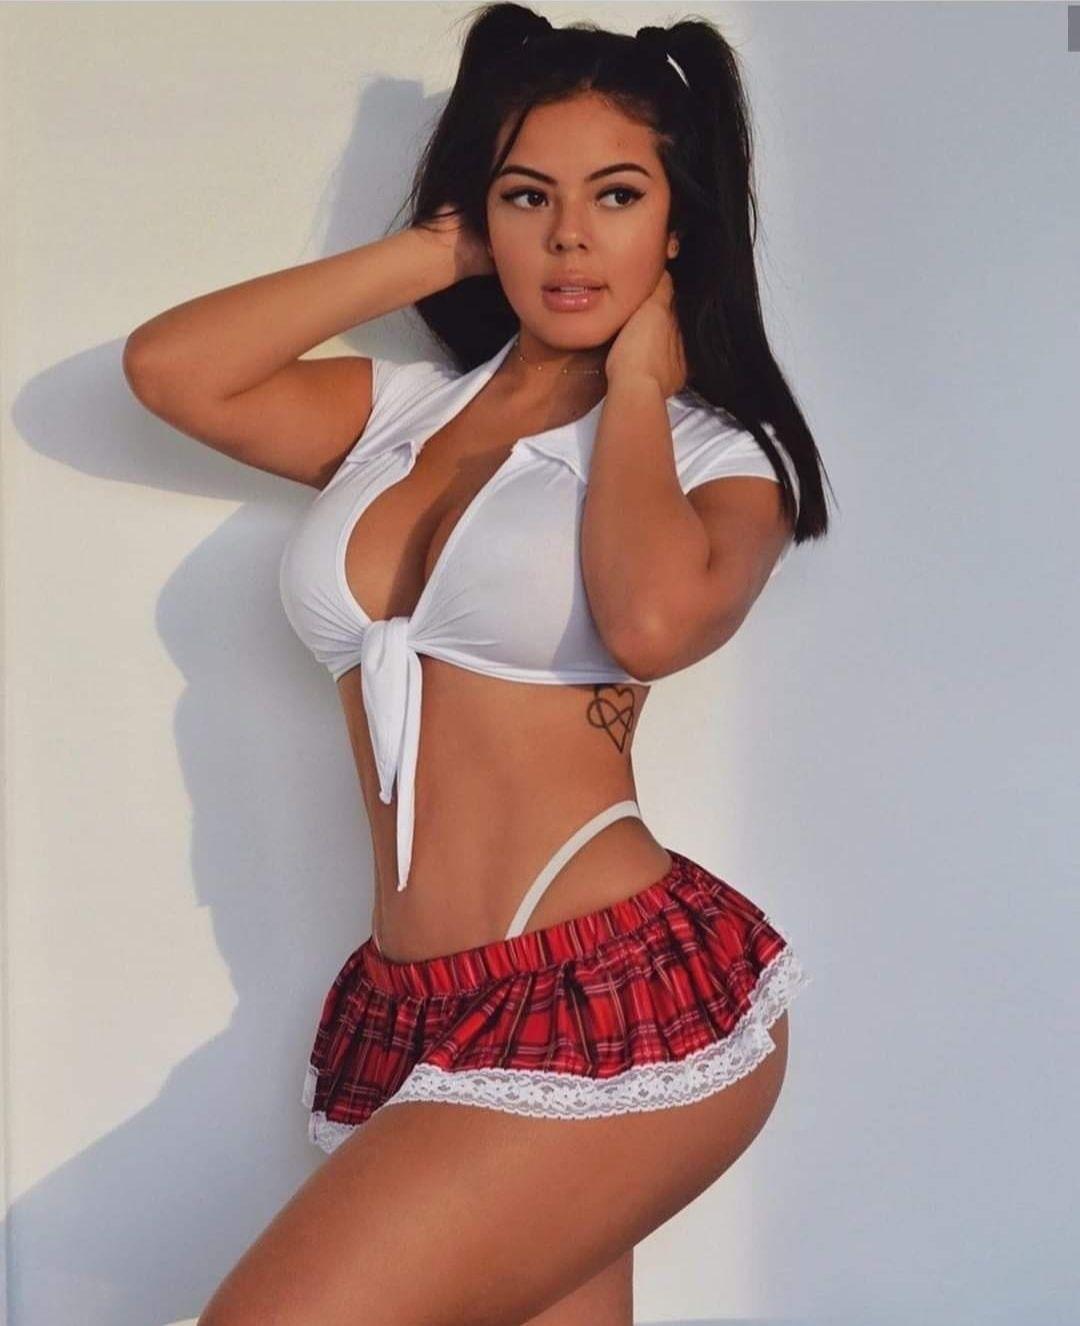 Naughty Latina School Girl